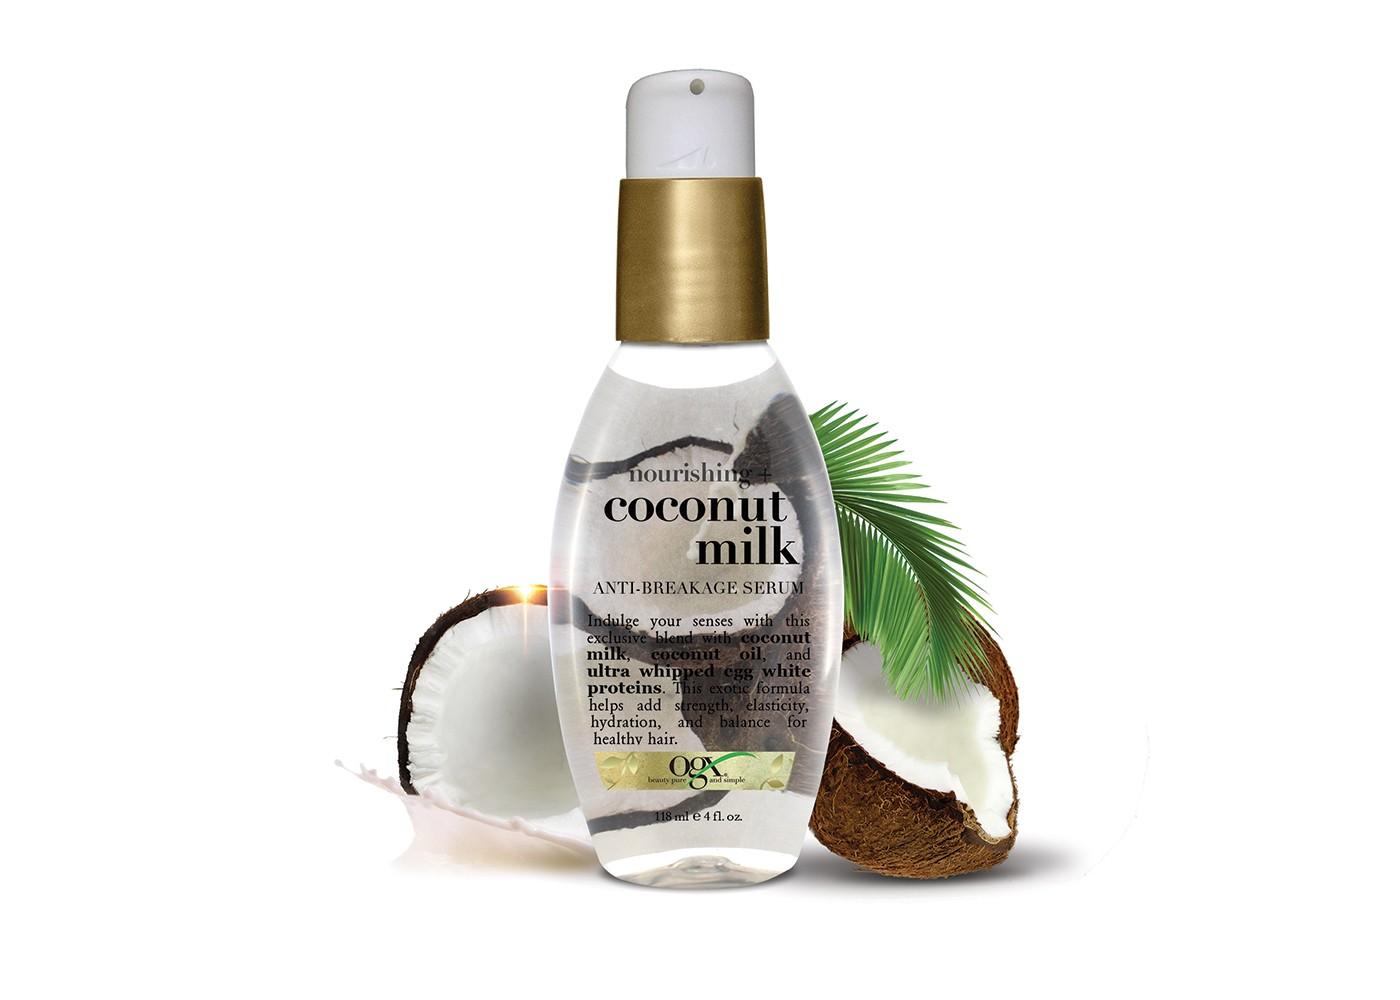 OGX  | Coconut Milk Anti-Breakage Serum |  $8.47